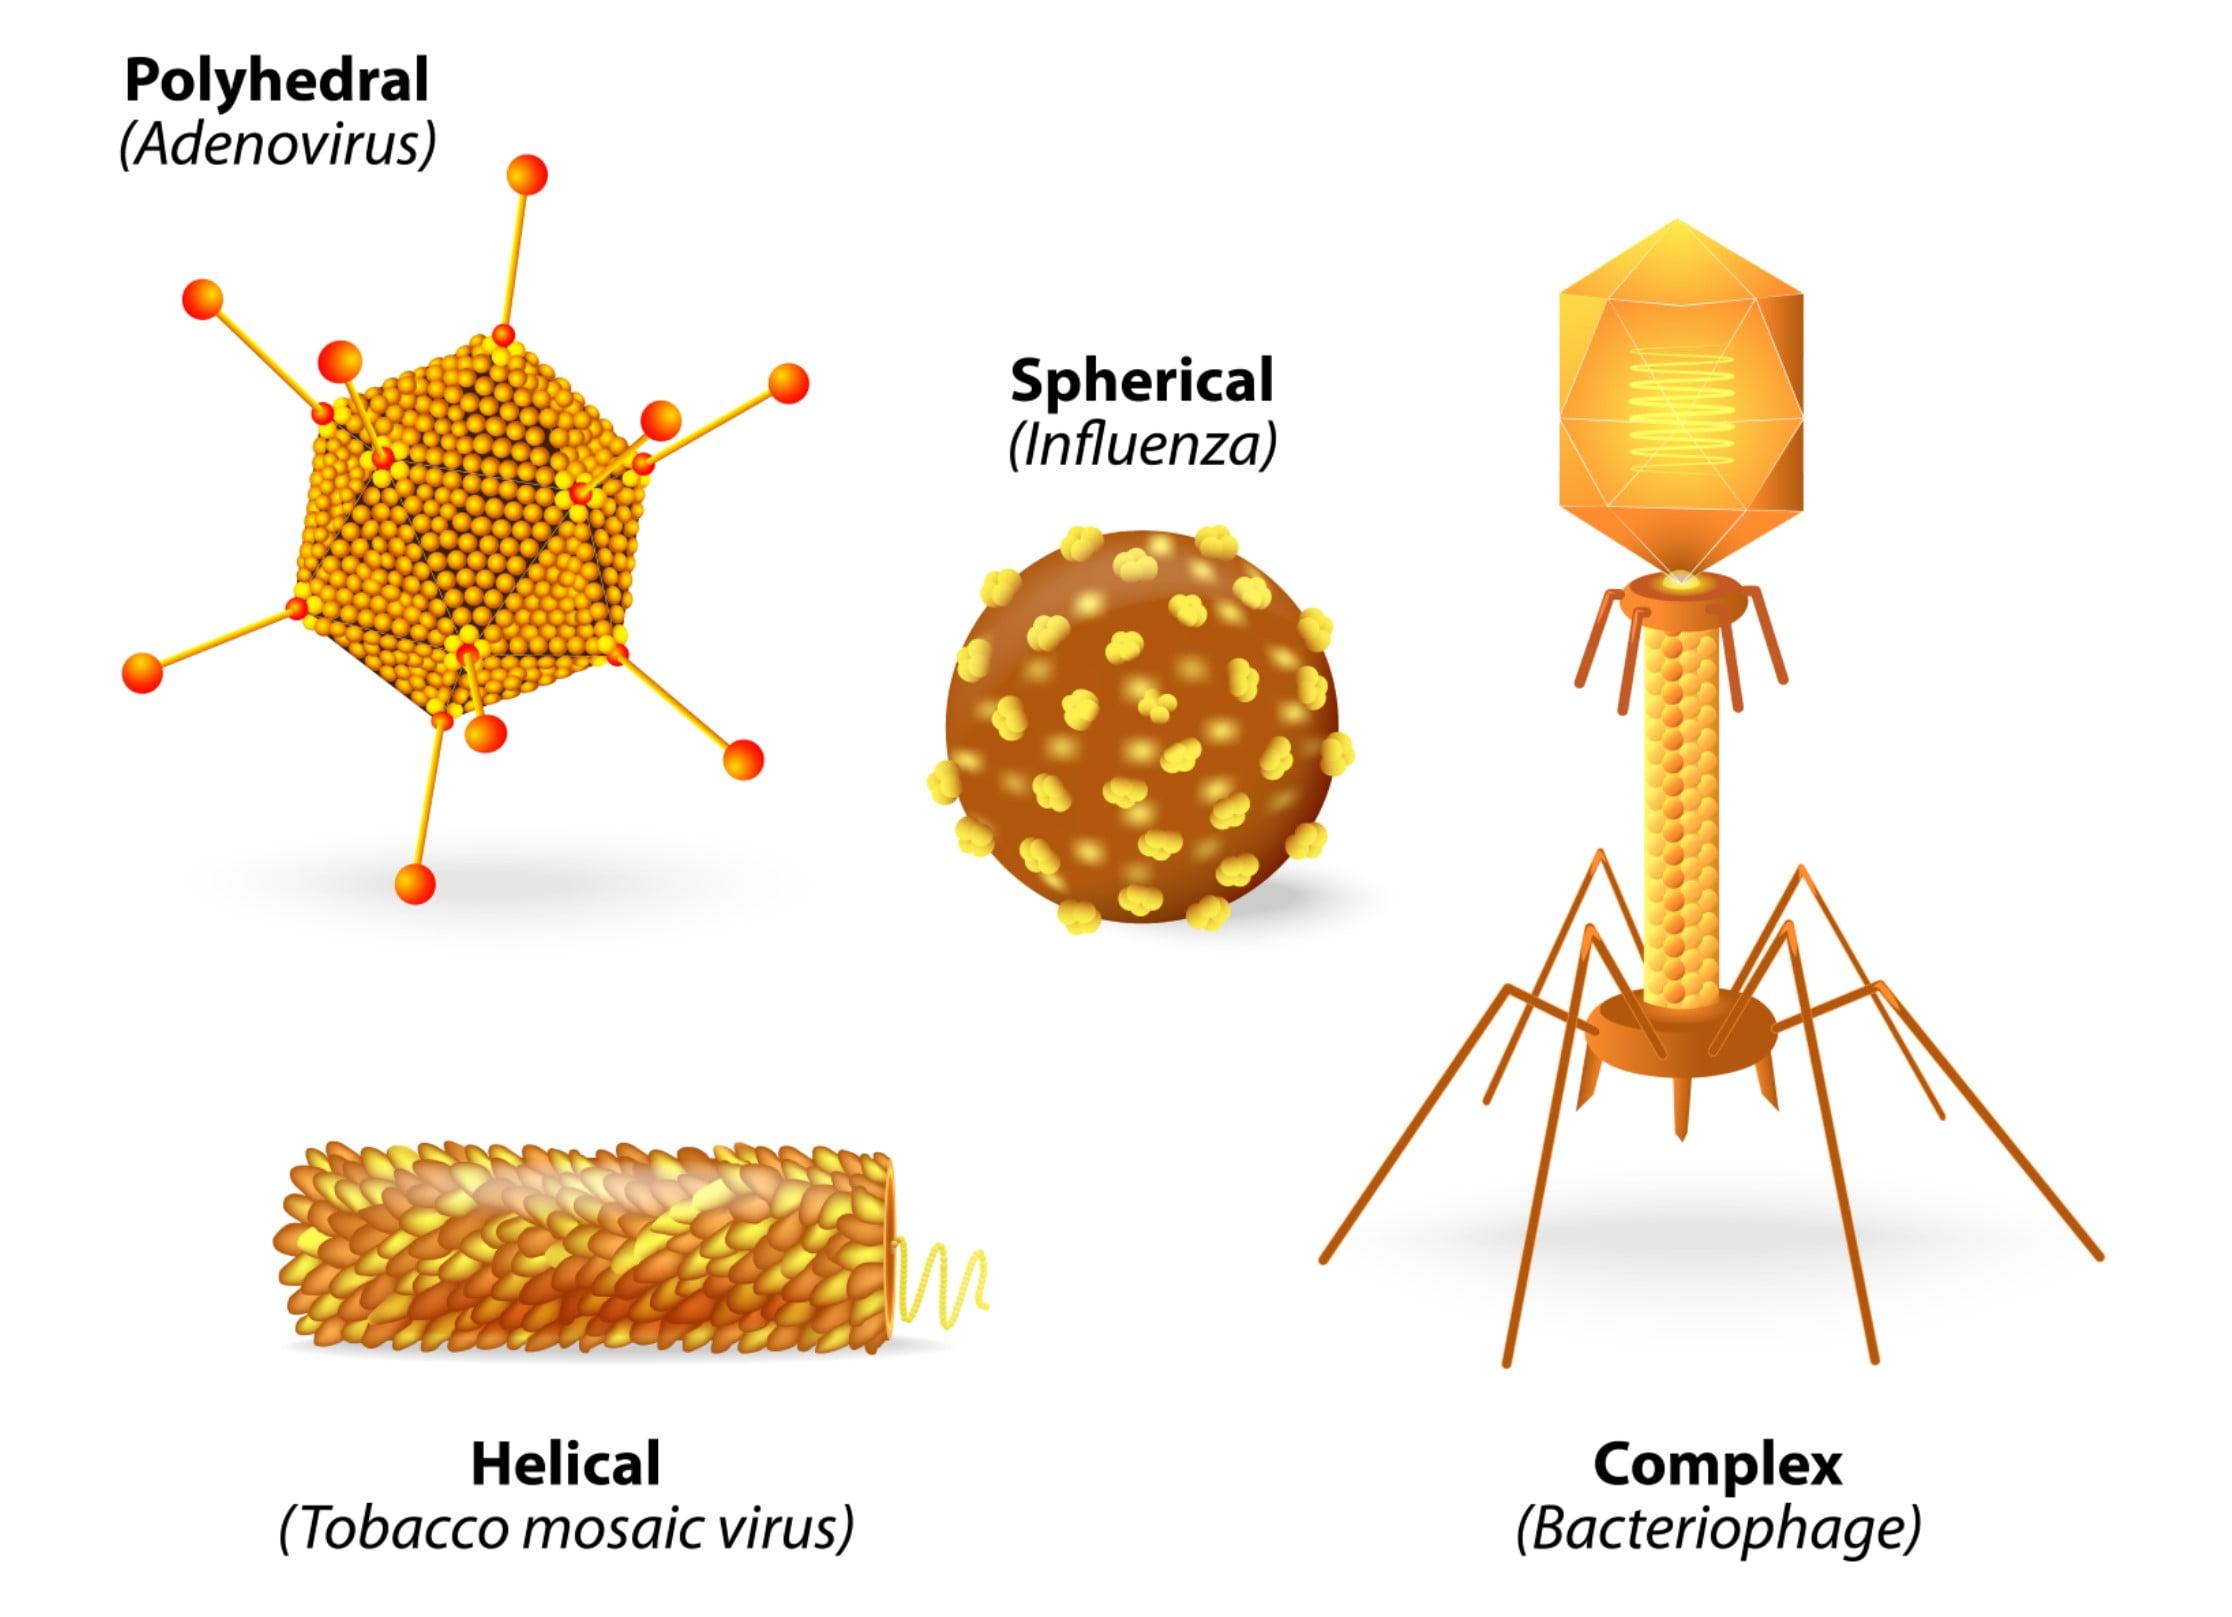 Virus shapes